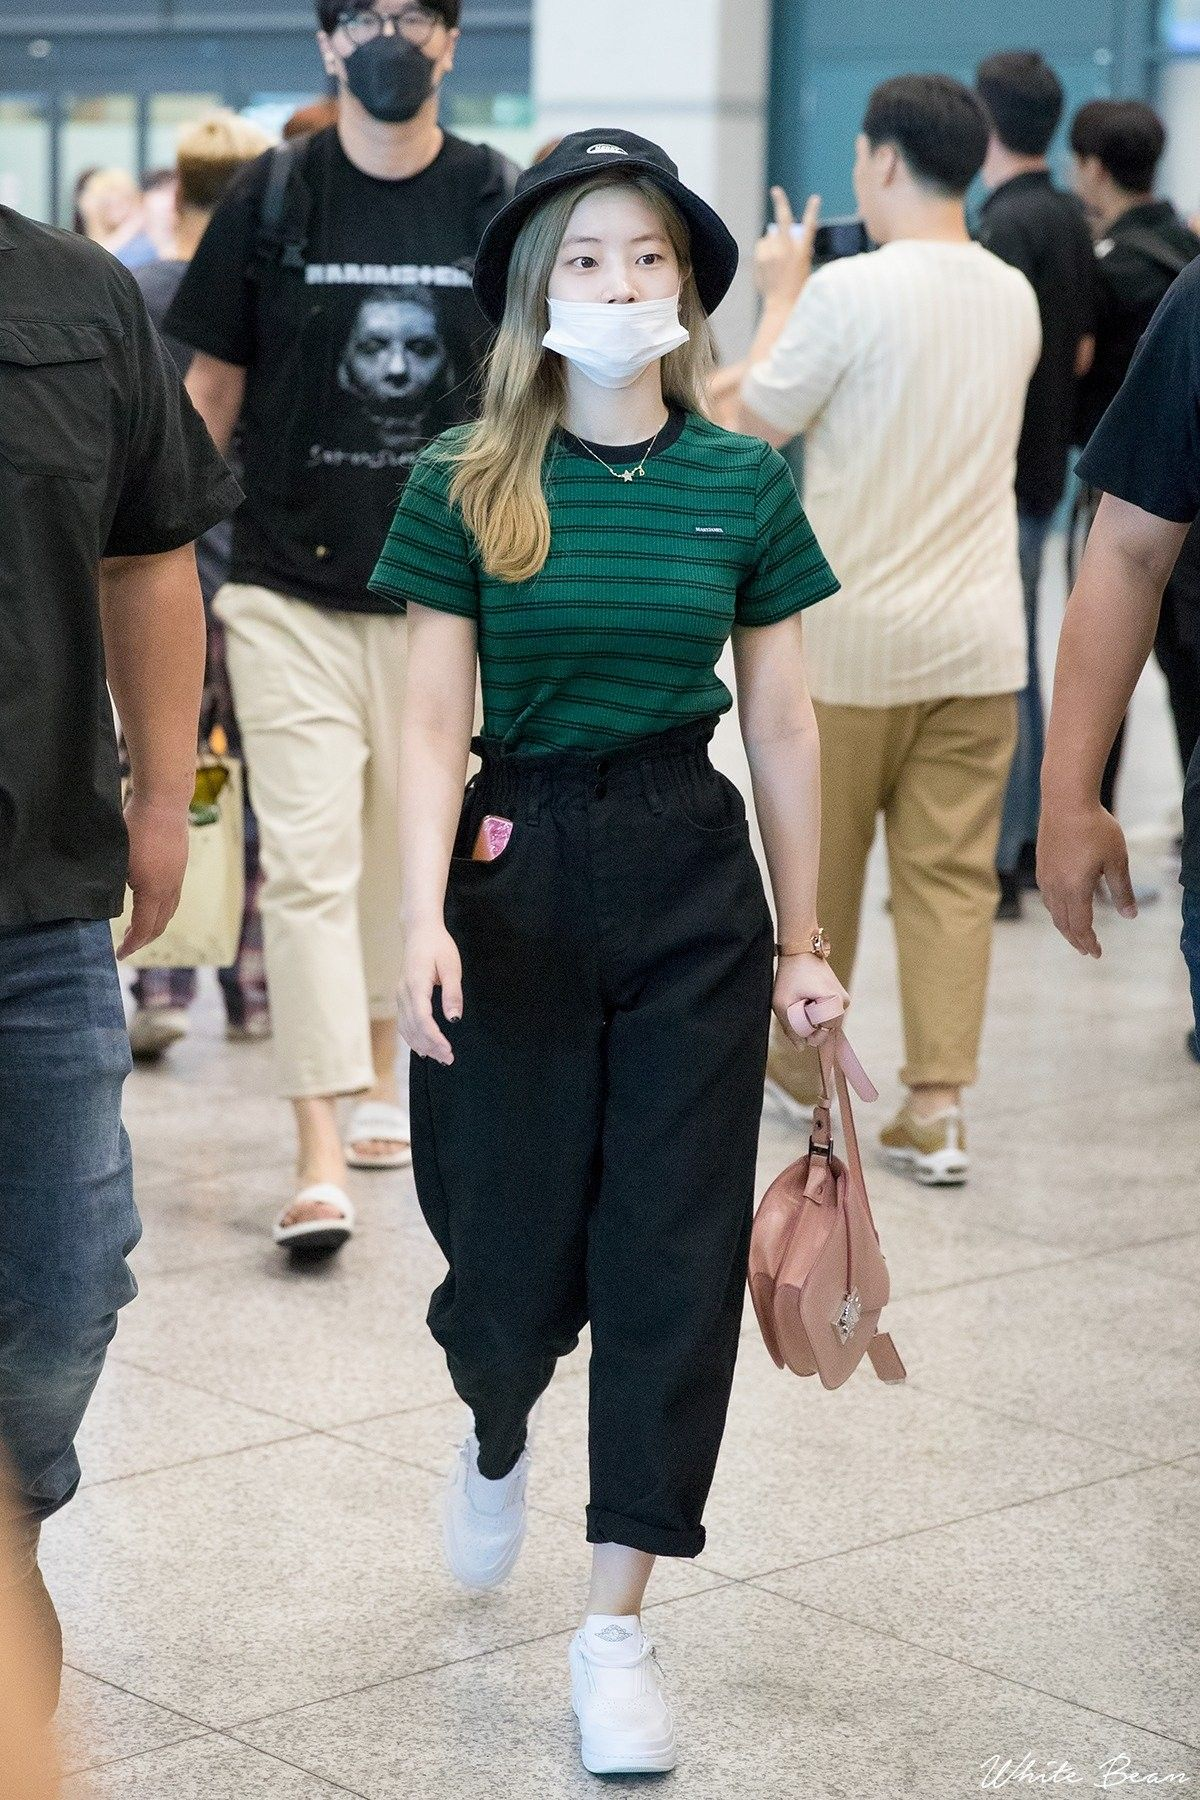 Dahyun Twice Kpop Korean Airport Fashion Kpop Fashion Outfits Kpop Fashion